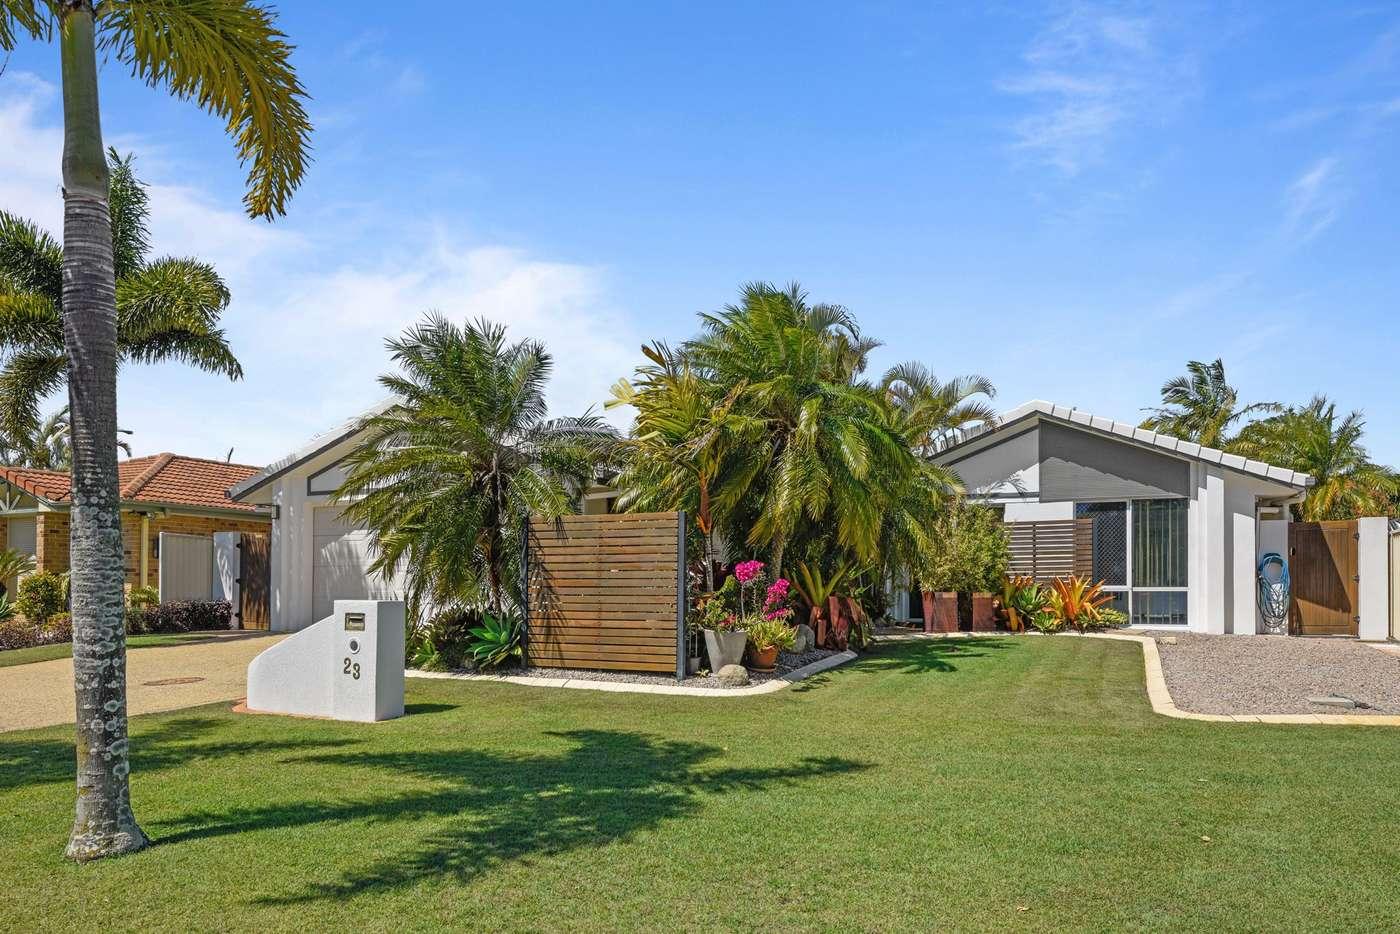 Main view of Homely house listing, 23 Catamaran Court, Banksia Beach QLD 4507